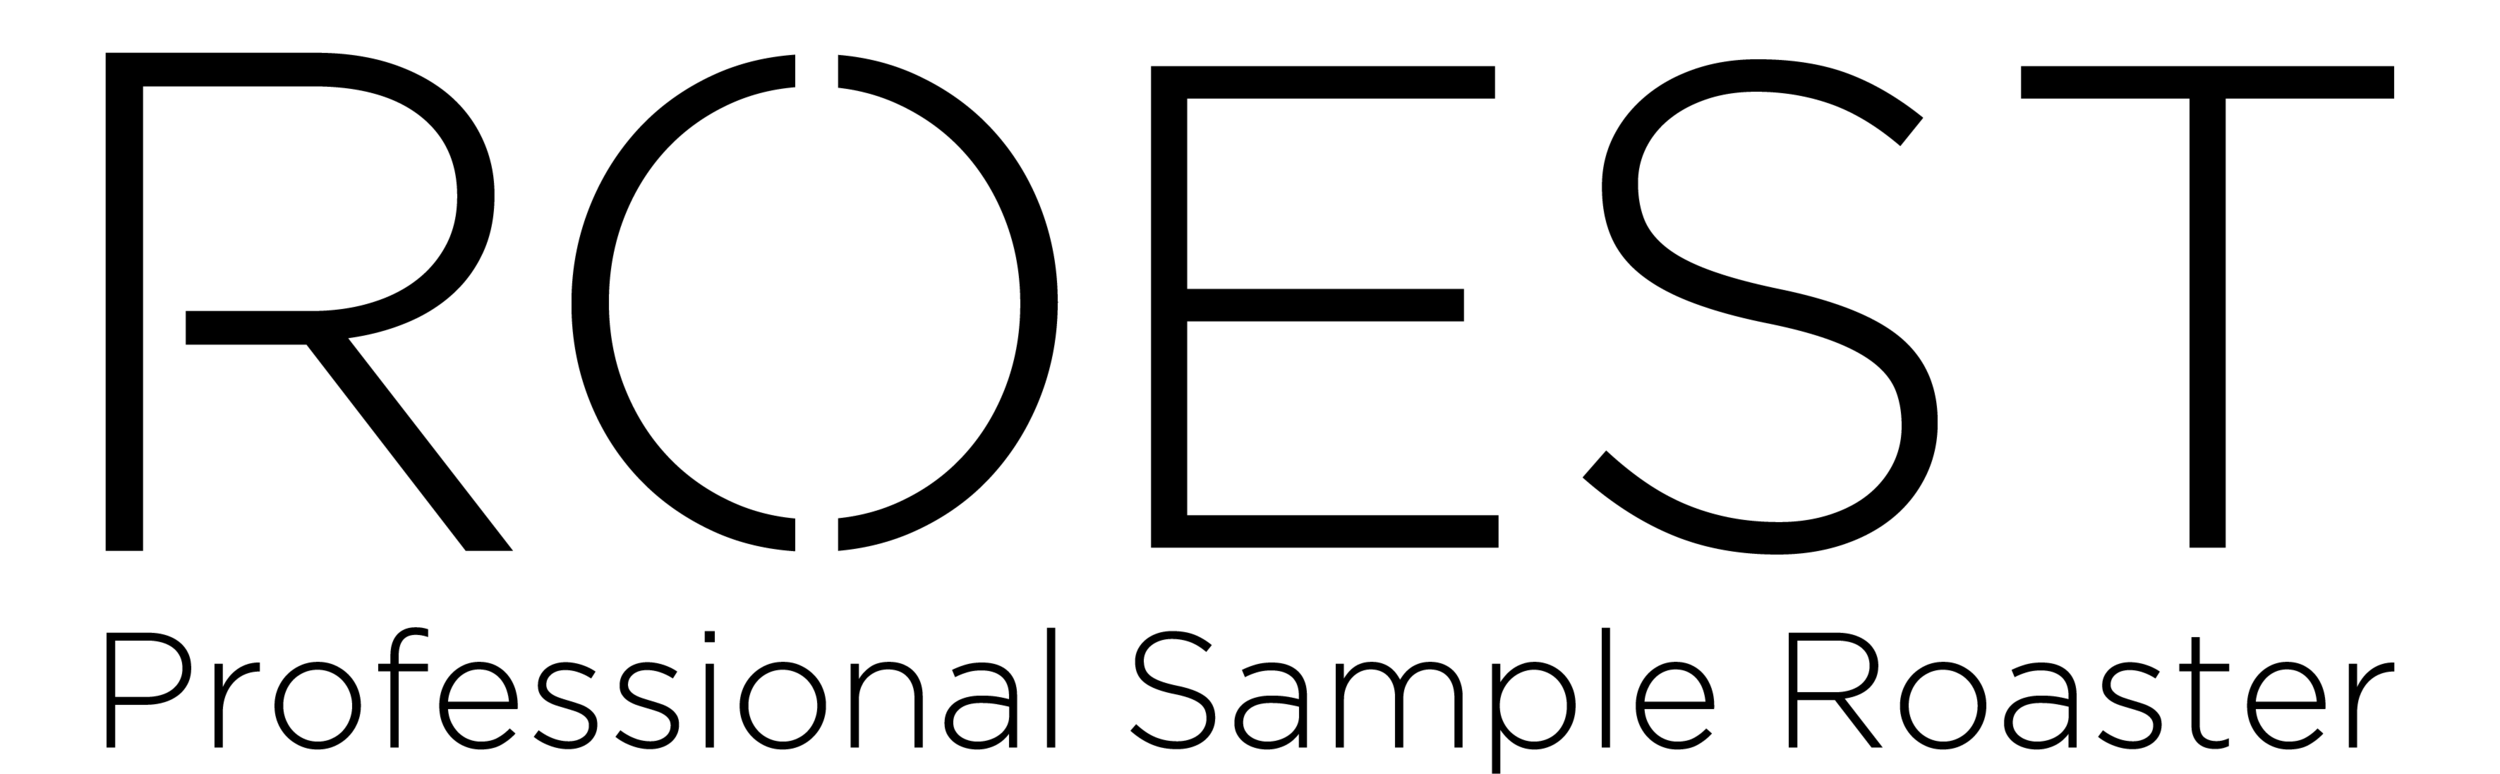 ROEST svart m tekst 050319.png